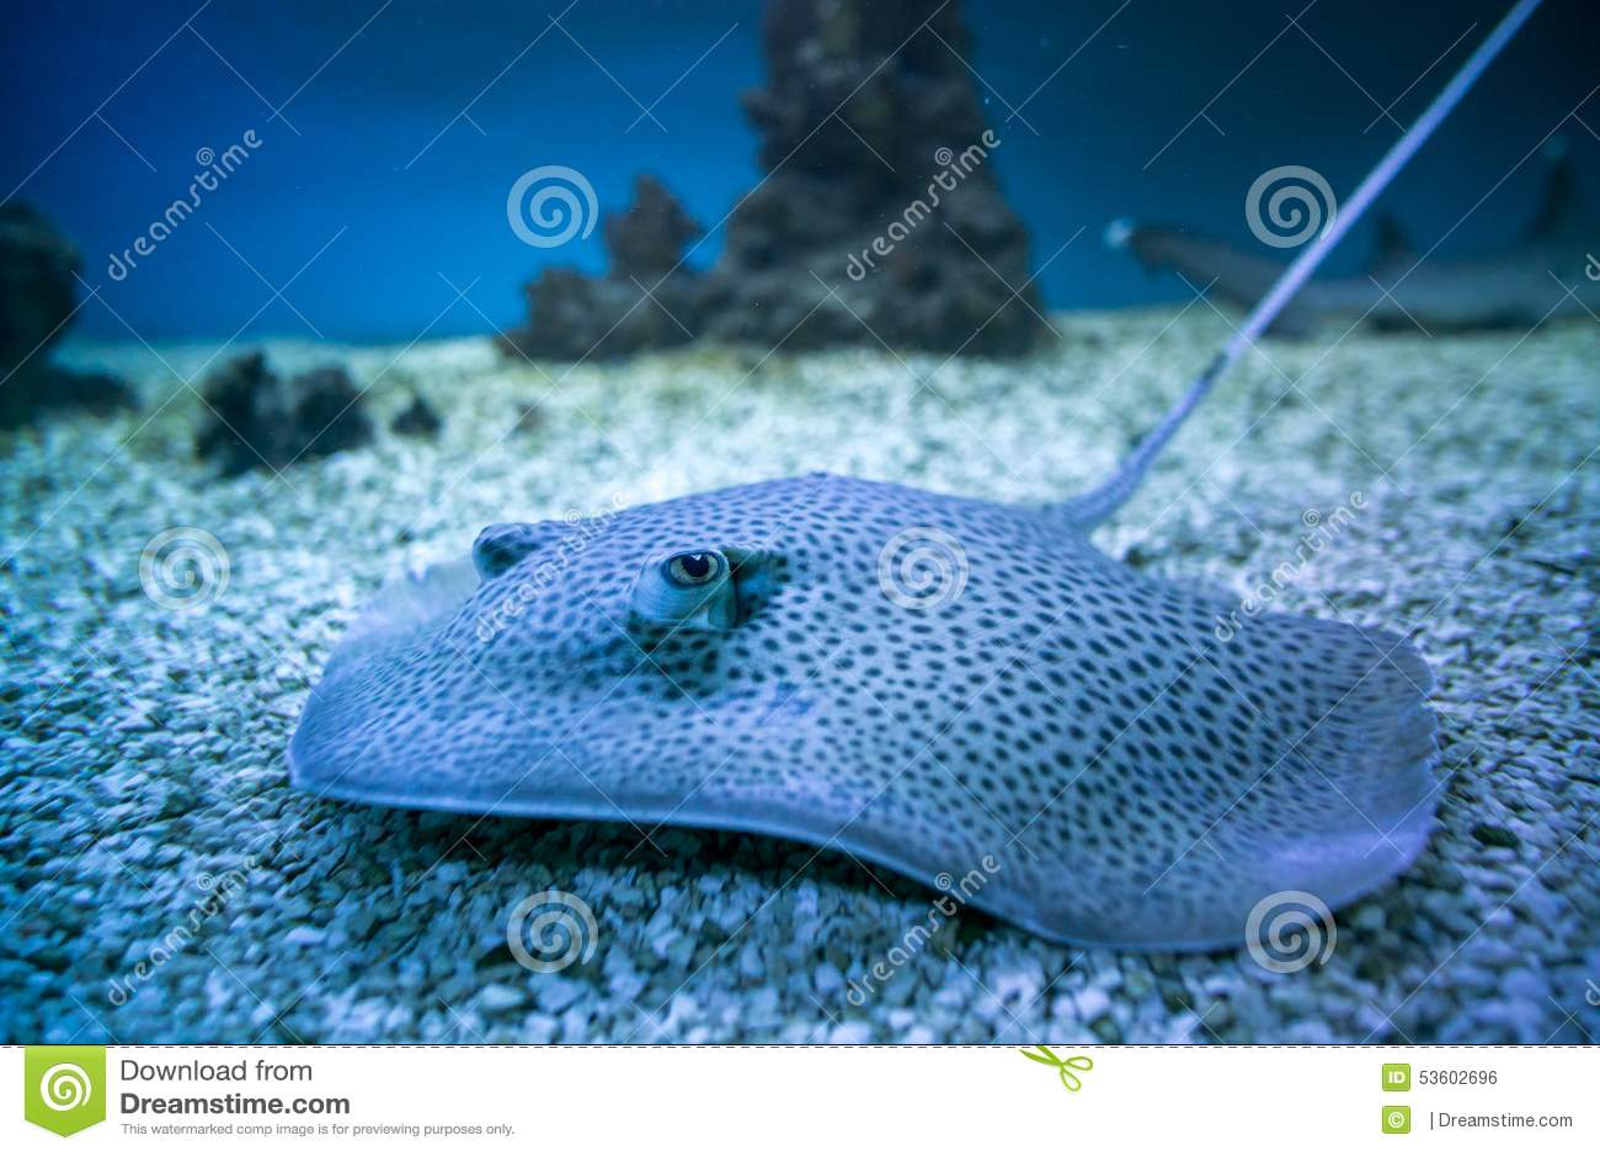 Spotted stingray fish in aquarium stock photo image for Stingray fish tank